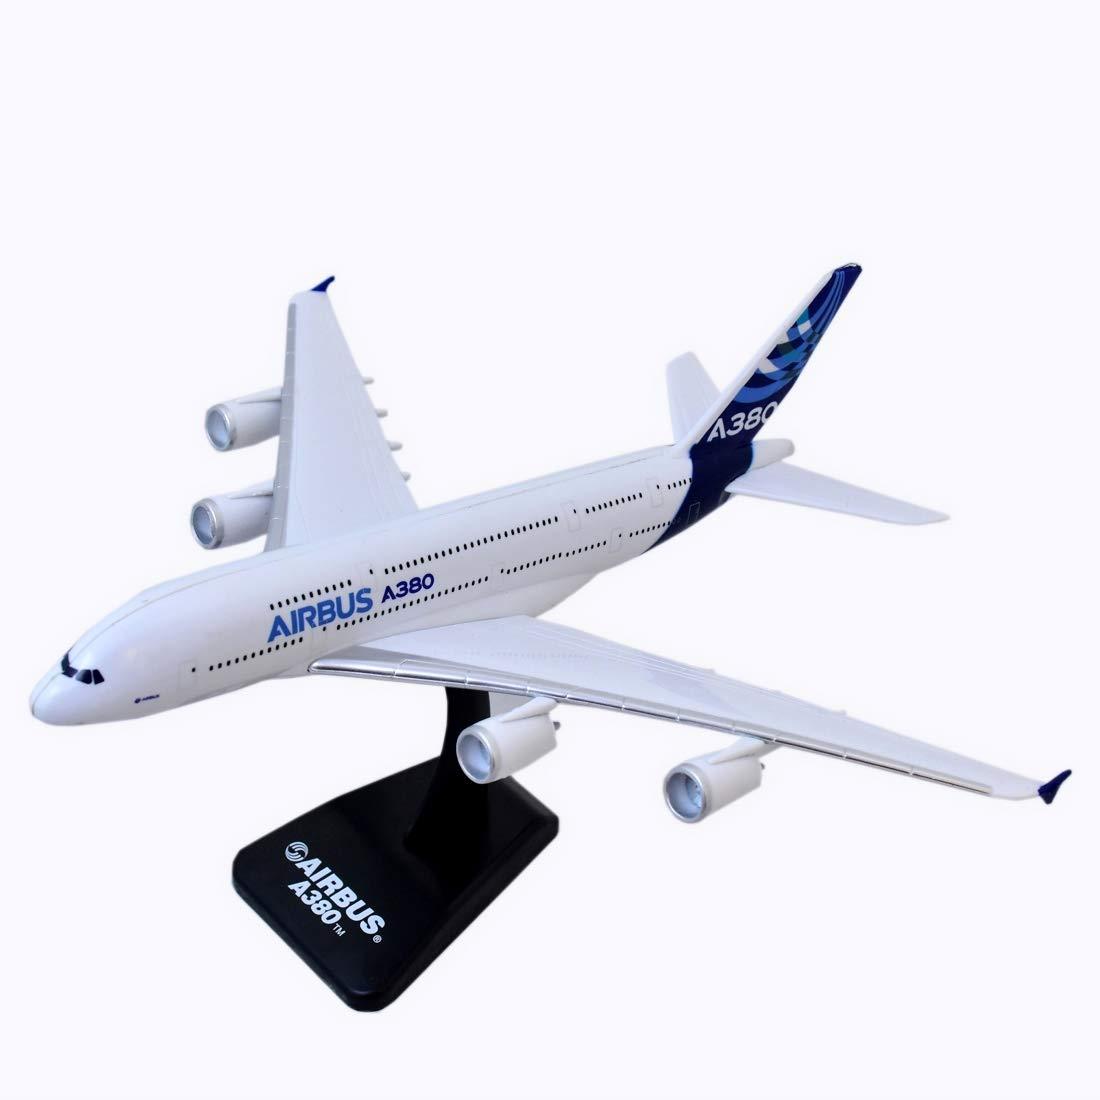 /échelle 1: 300 Avion Skypilot pour passagers Amaerican Airlines Boing 777-200 ligne AA New Ray 20343